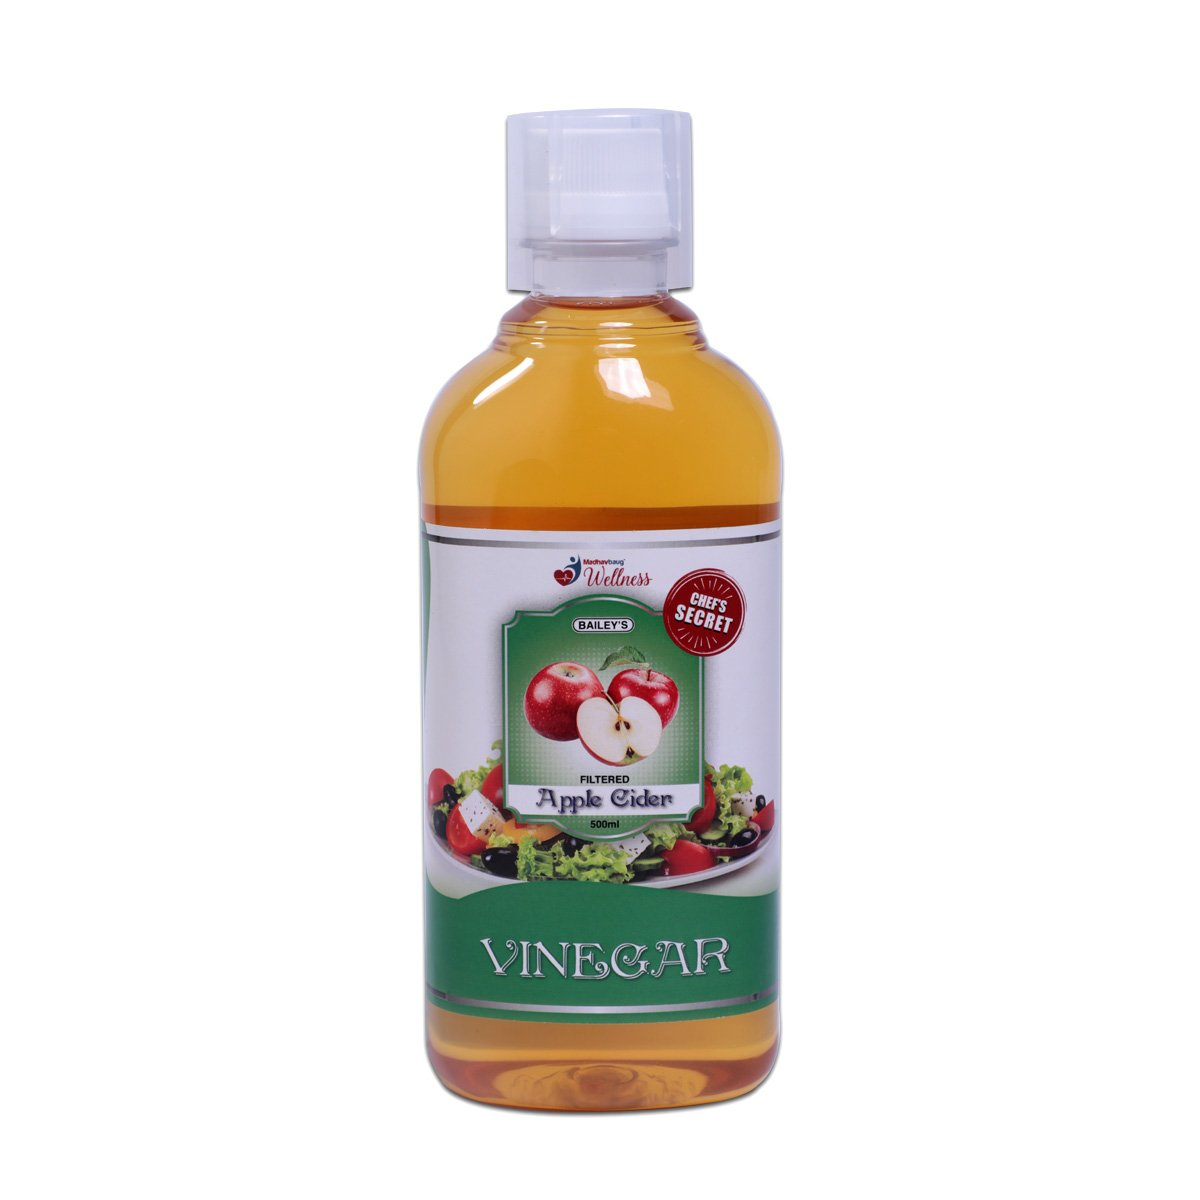 Bailey's Apple Cider Vinegar Chef_s-secret-front